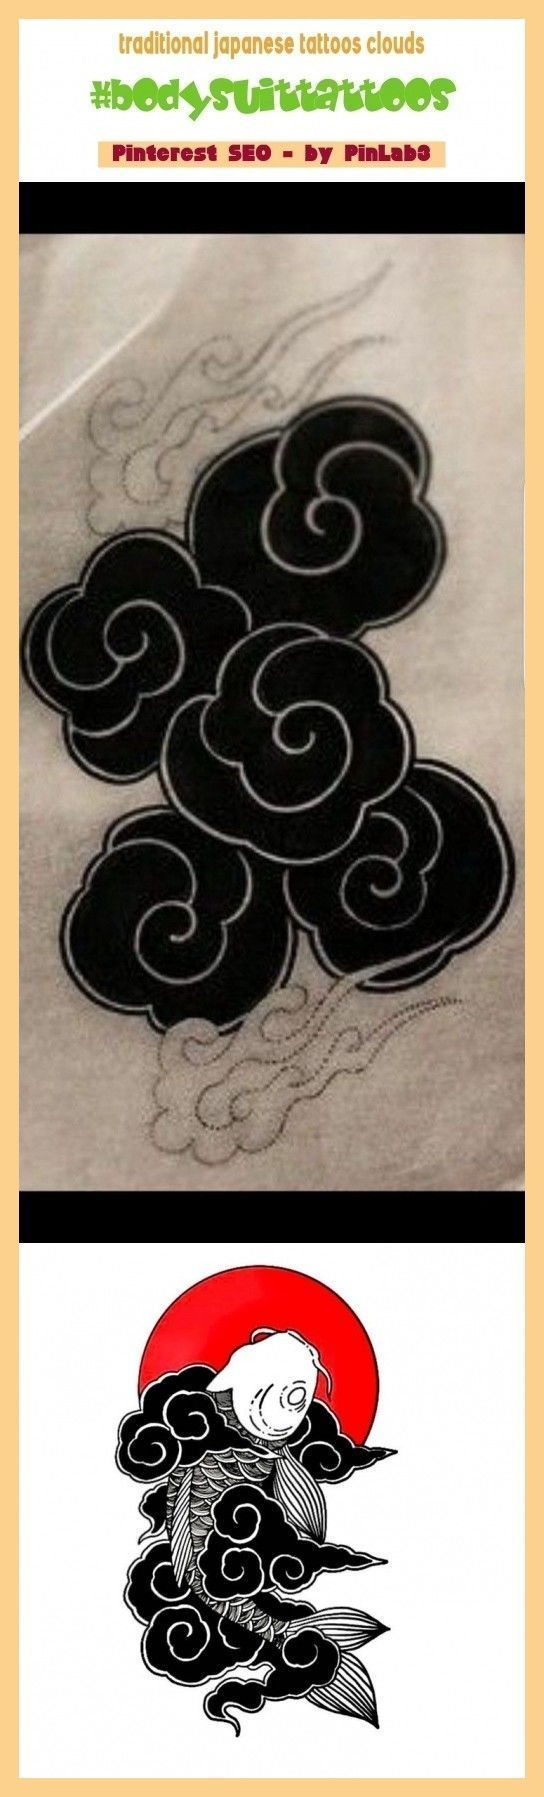 Japanese Dragon Tattoos Clouds Piercings - Piercings - Japanese Dragon Tattoos Clouds Piercings – Piercings Japanes